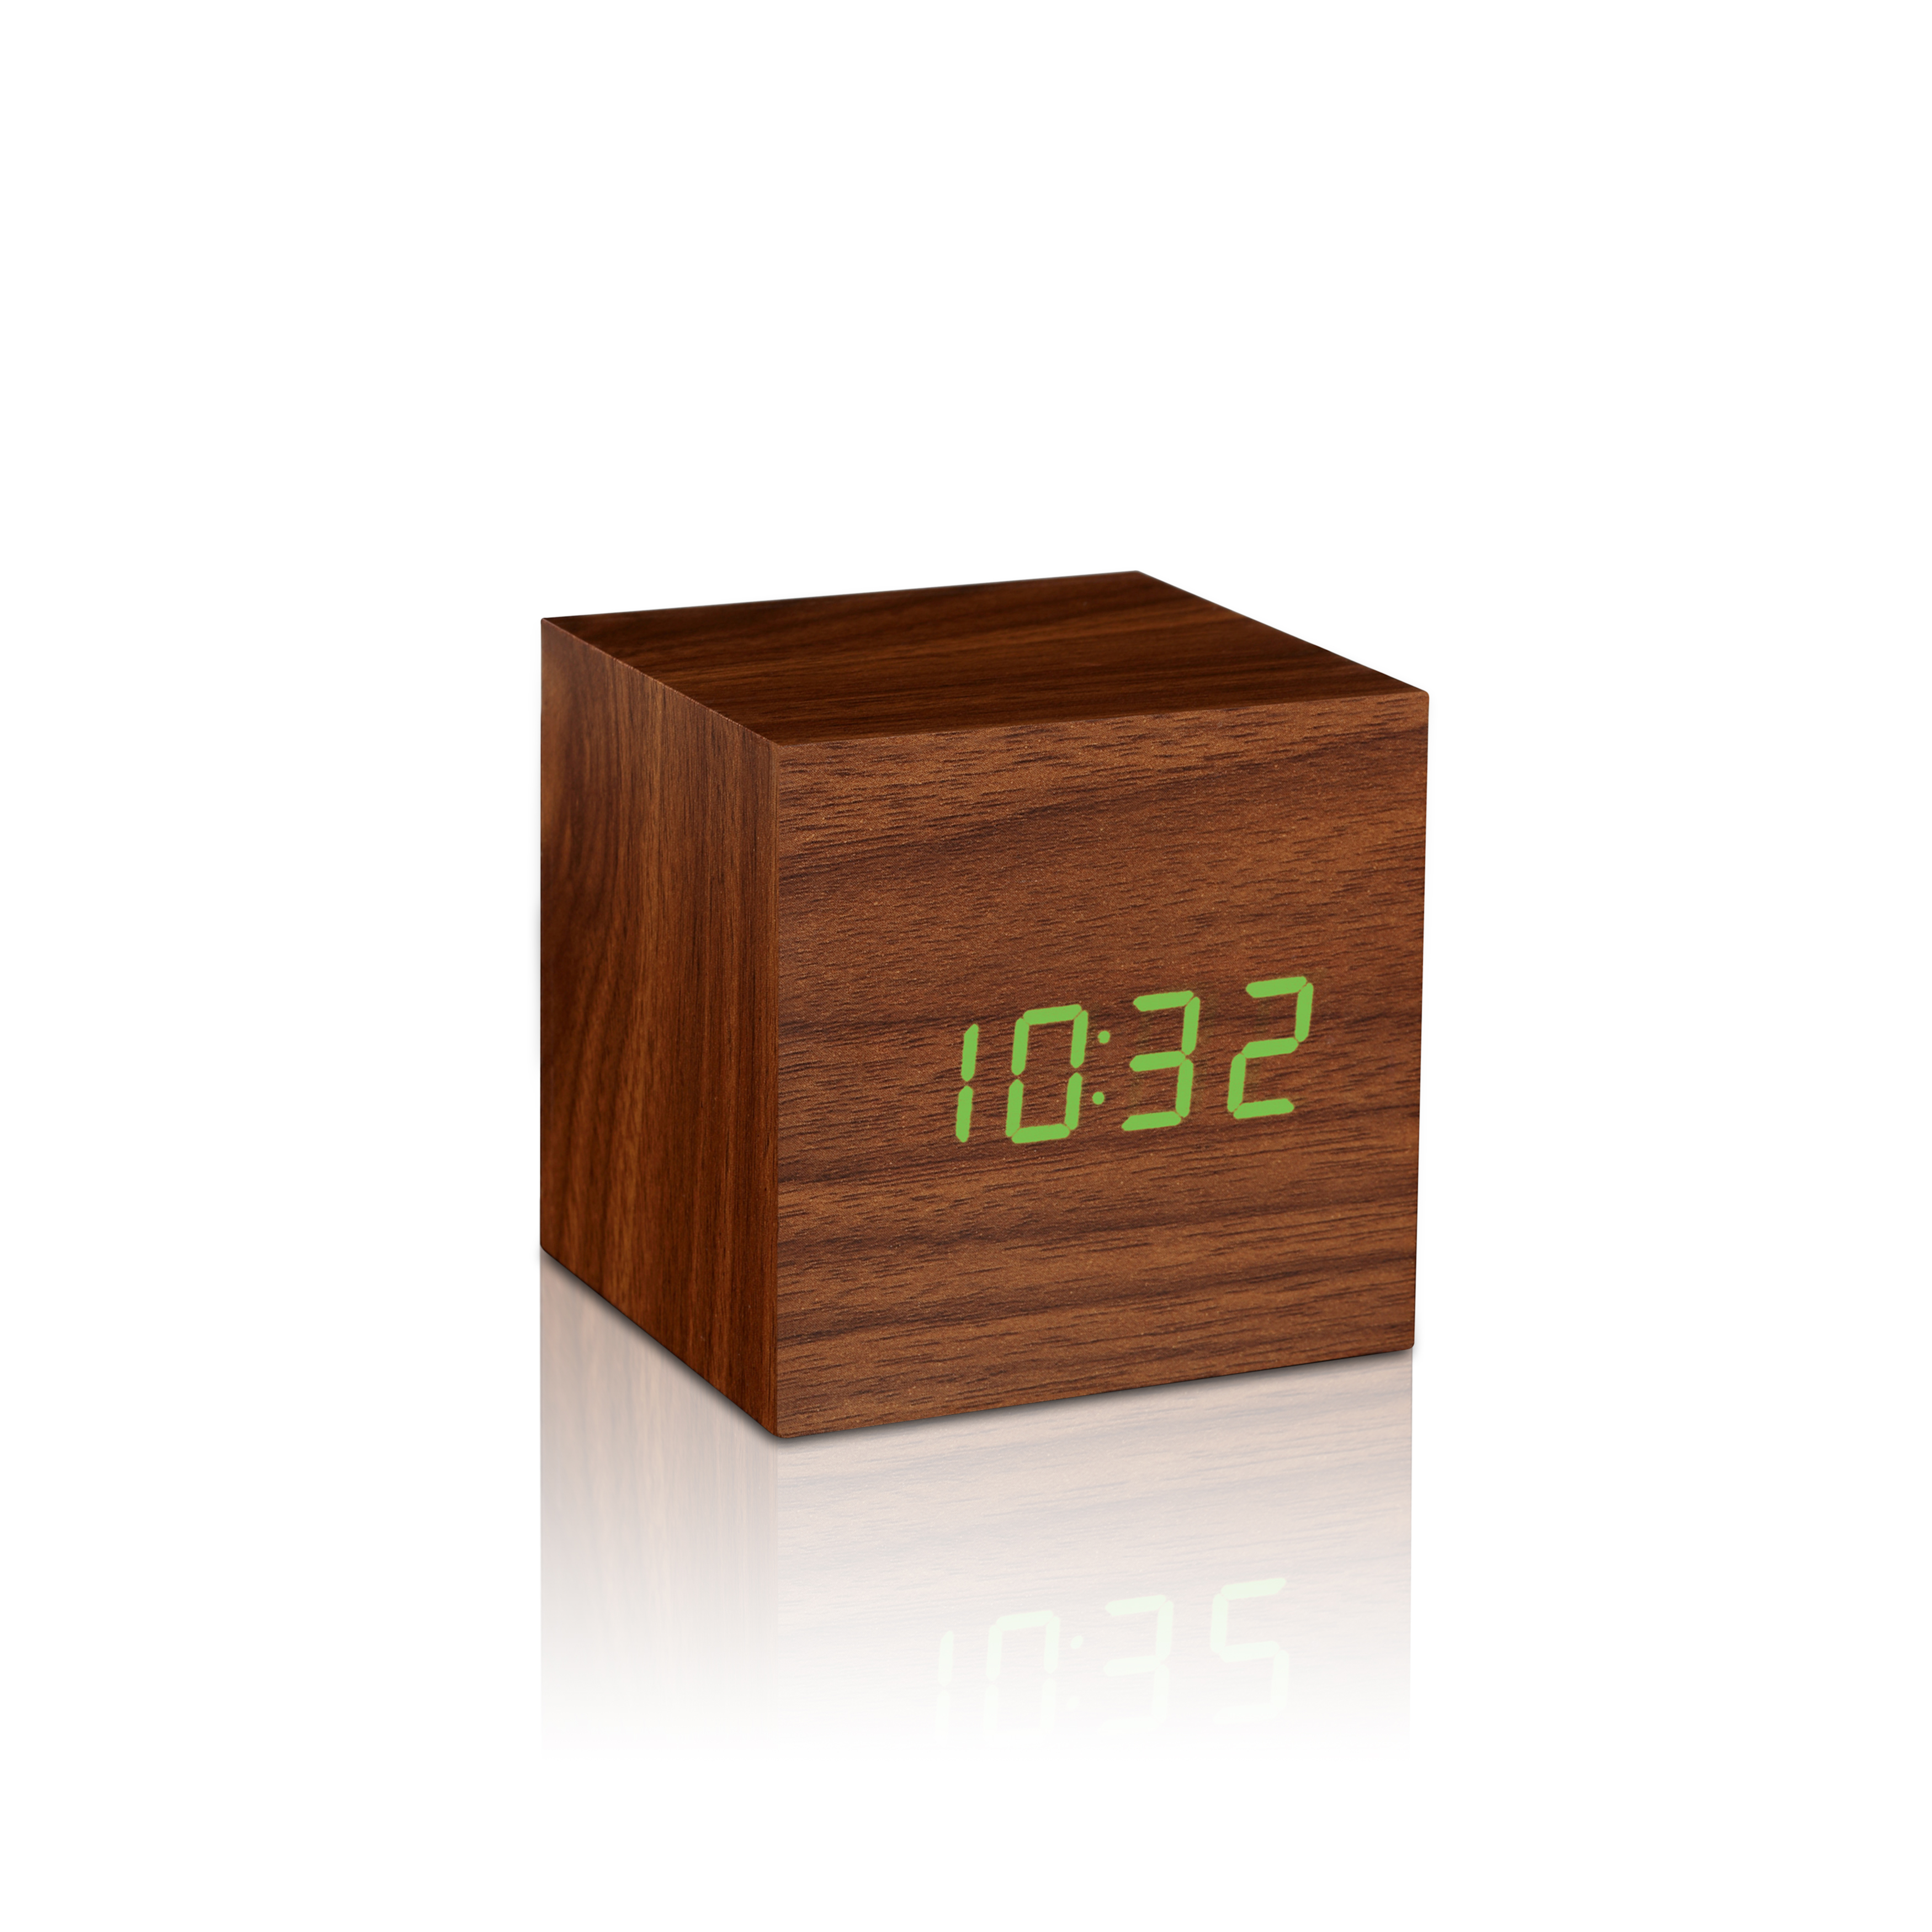 Ceas inteligent Cube Click Clock Walnut/Green